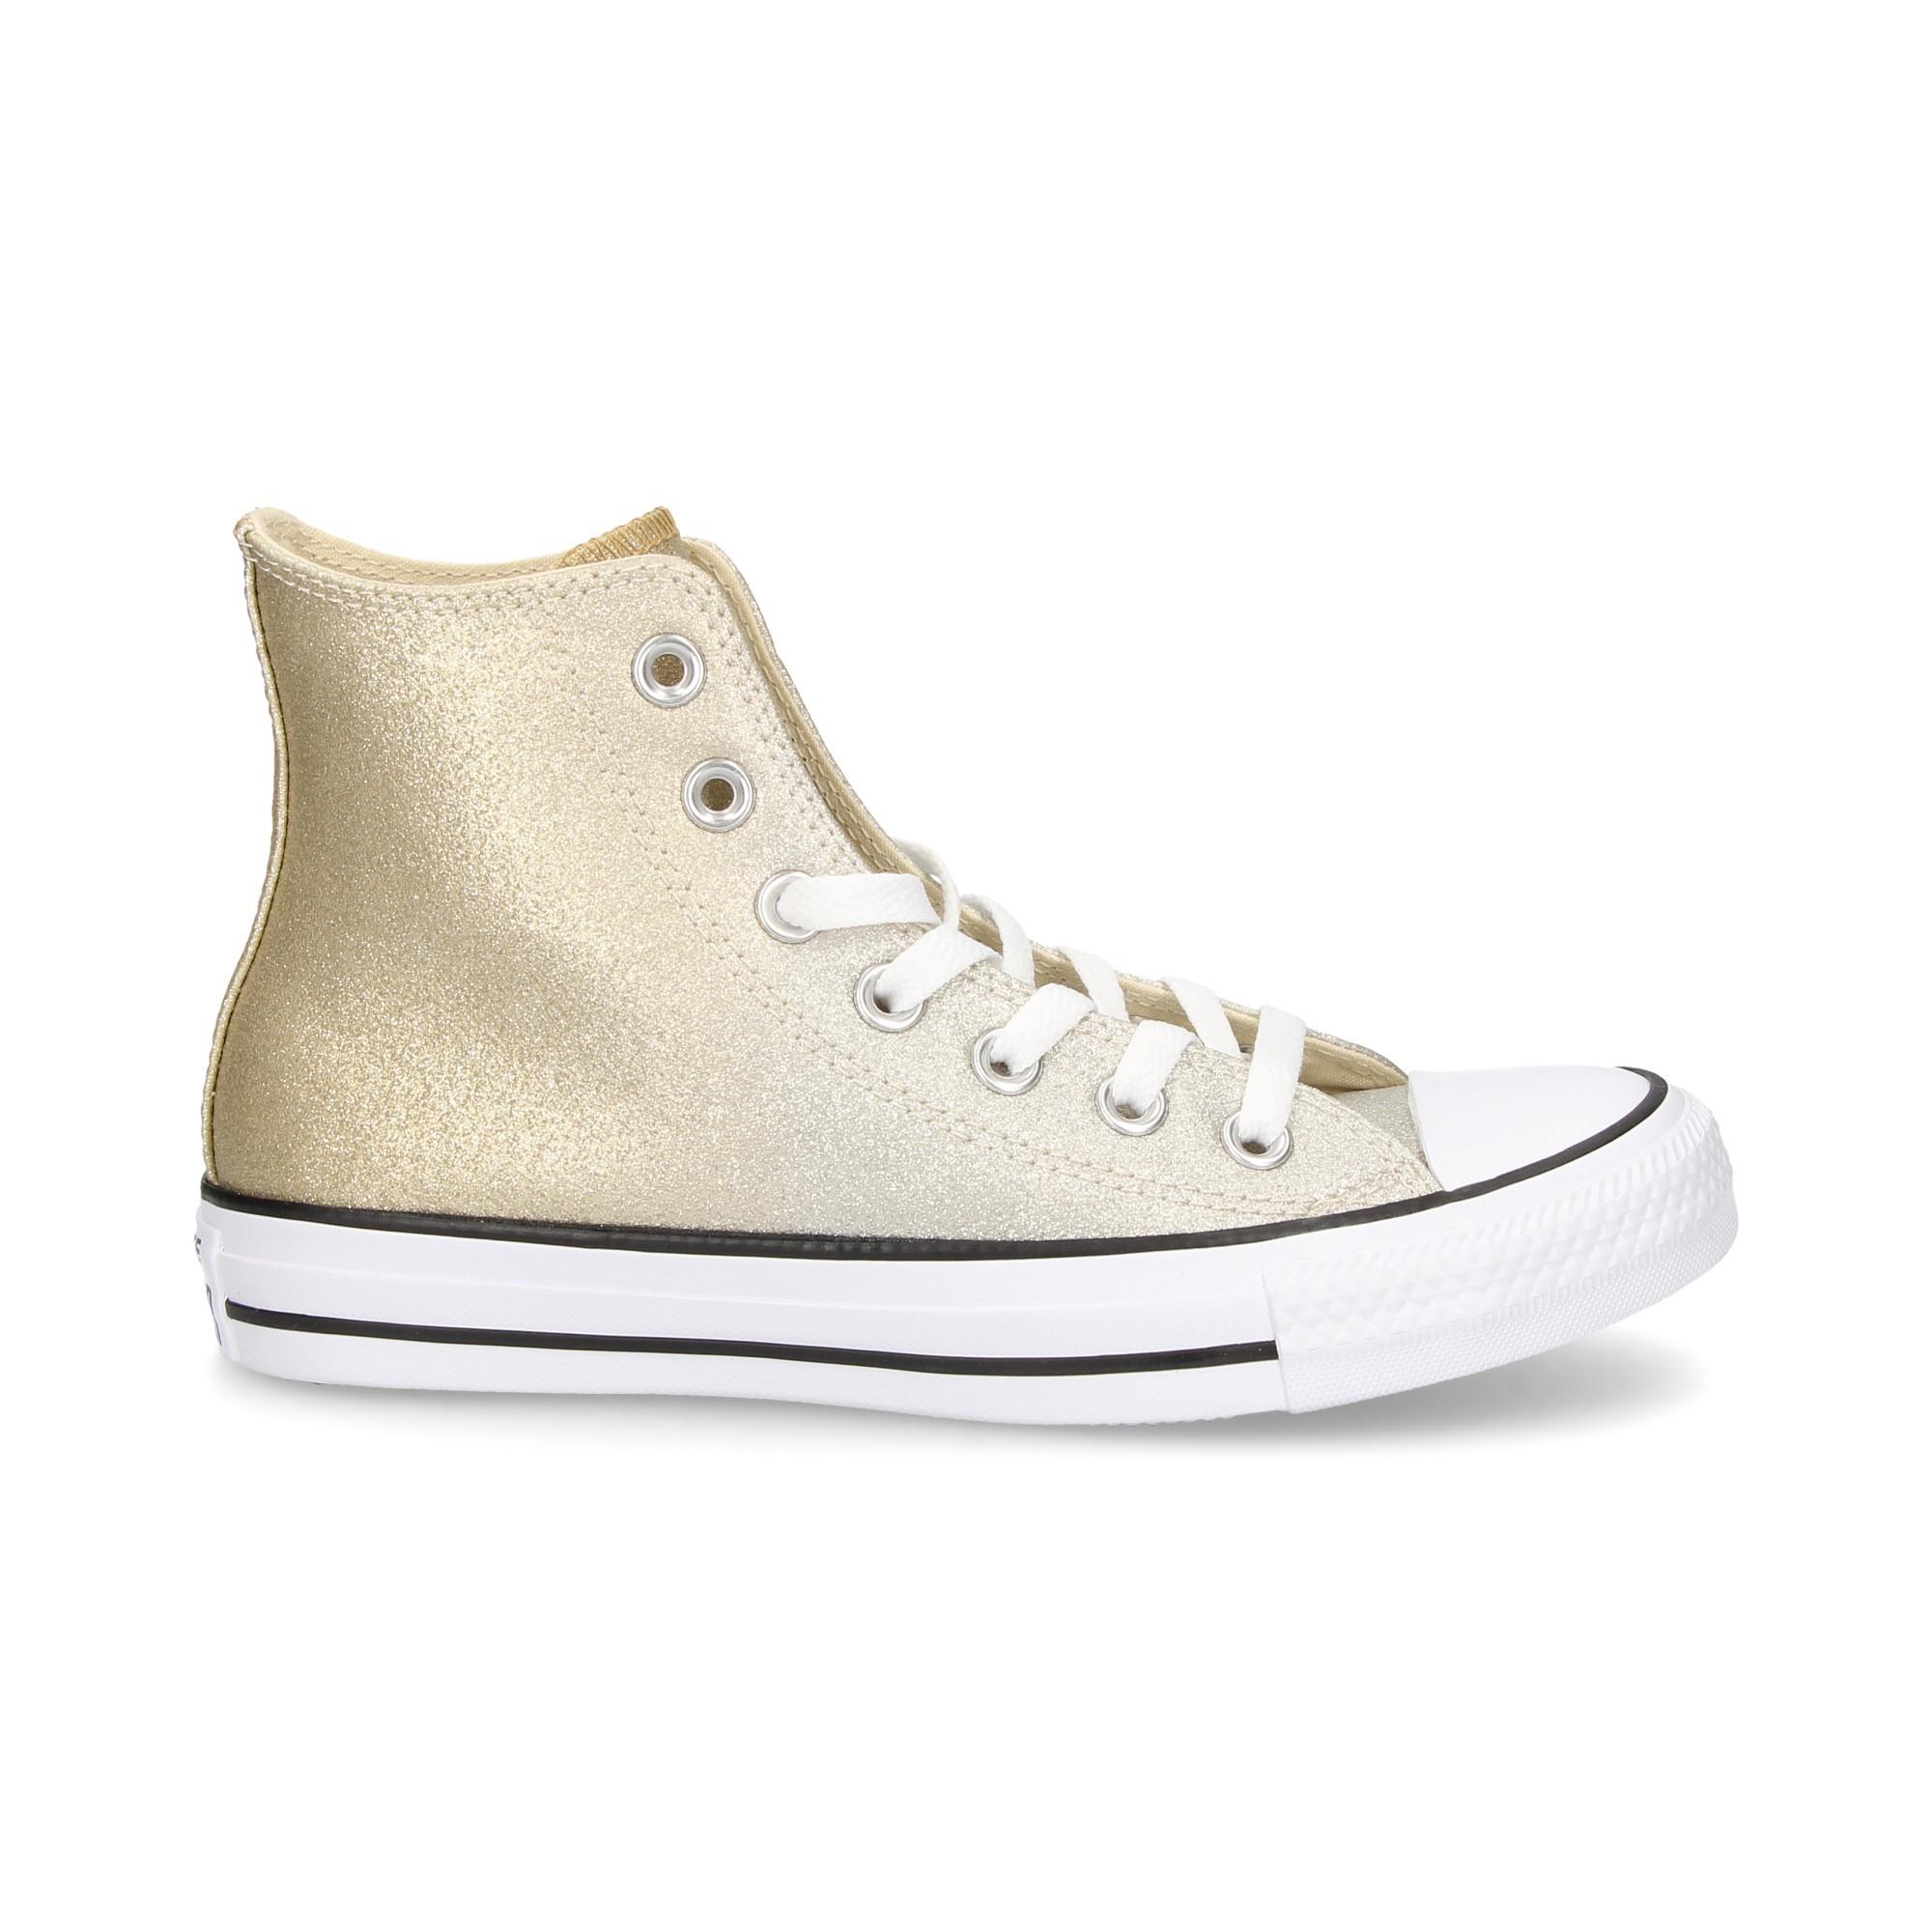 נעלי אולסטאר זהב מטאלי מנצנץ נשים Converse Ombre Silver Gold